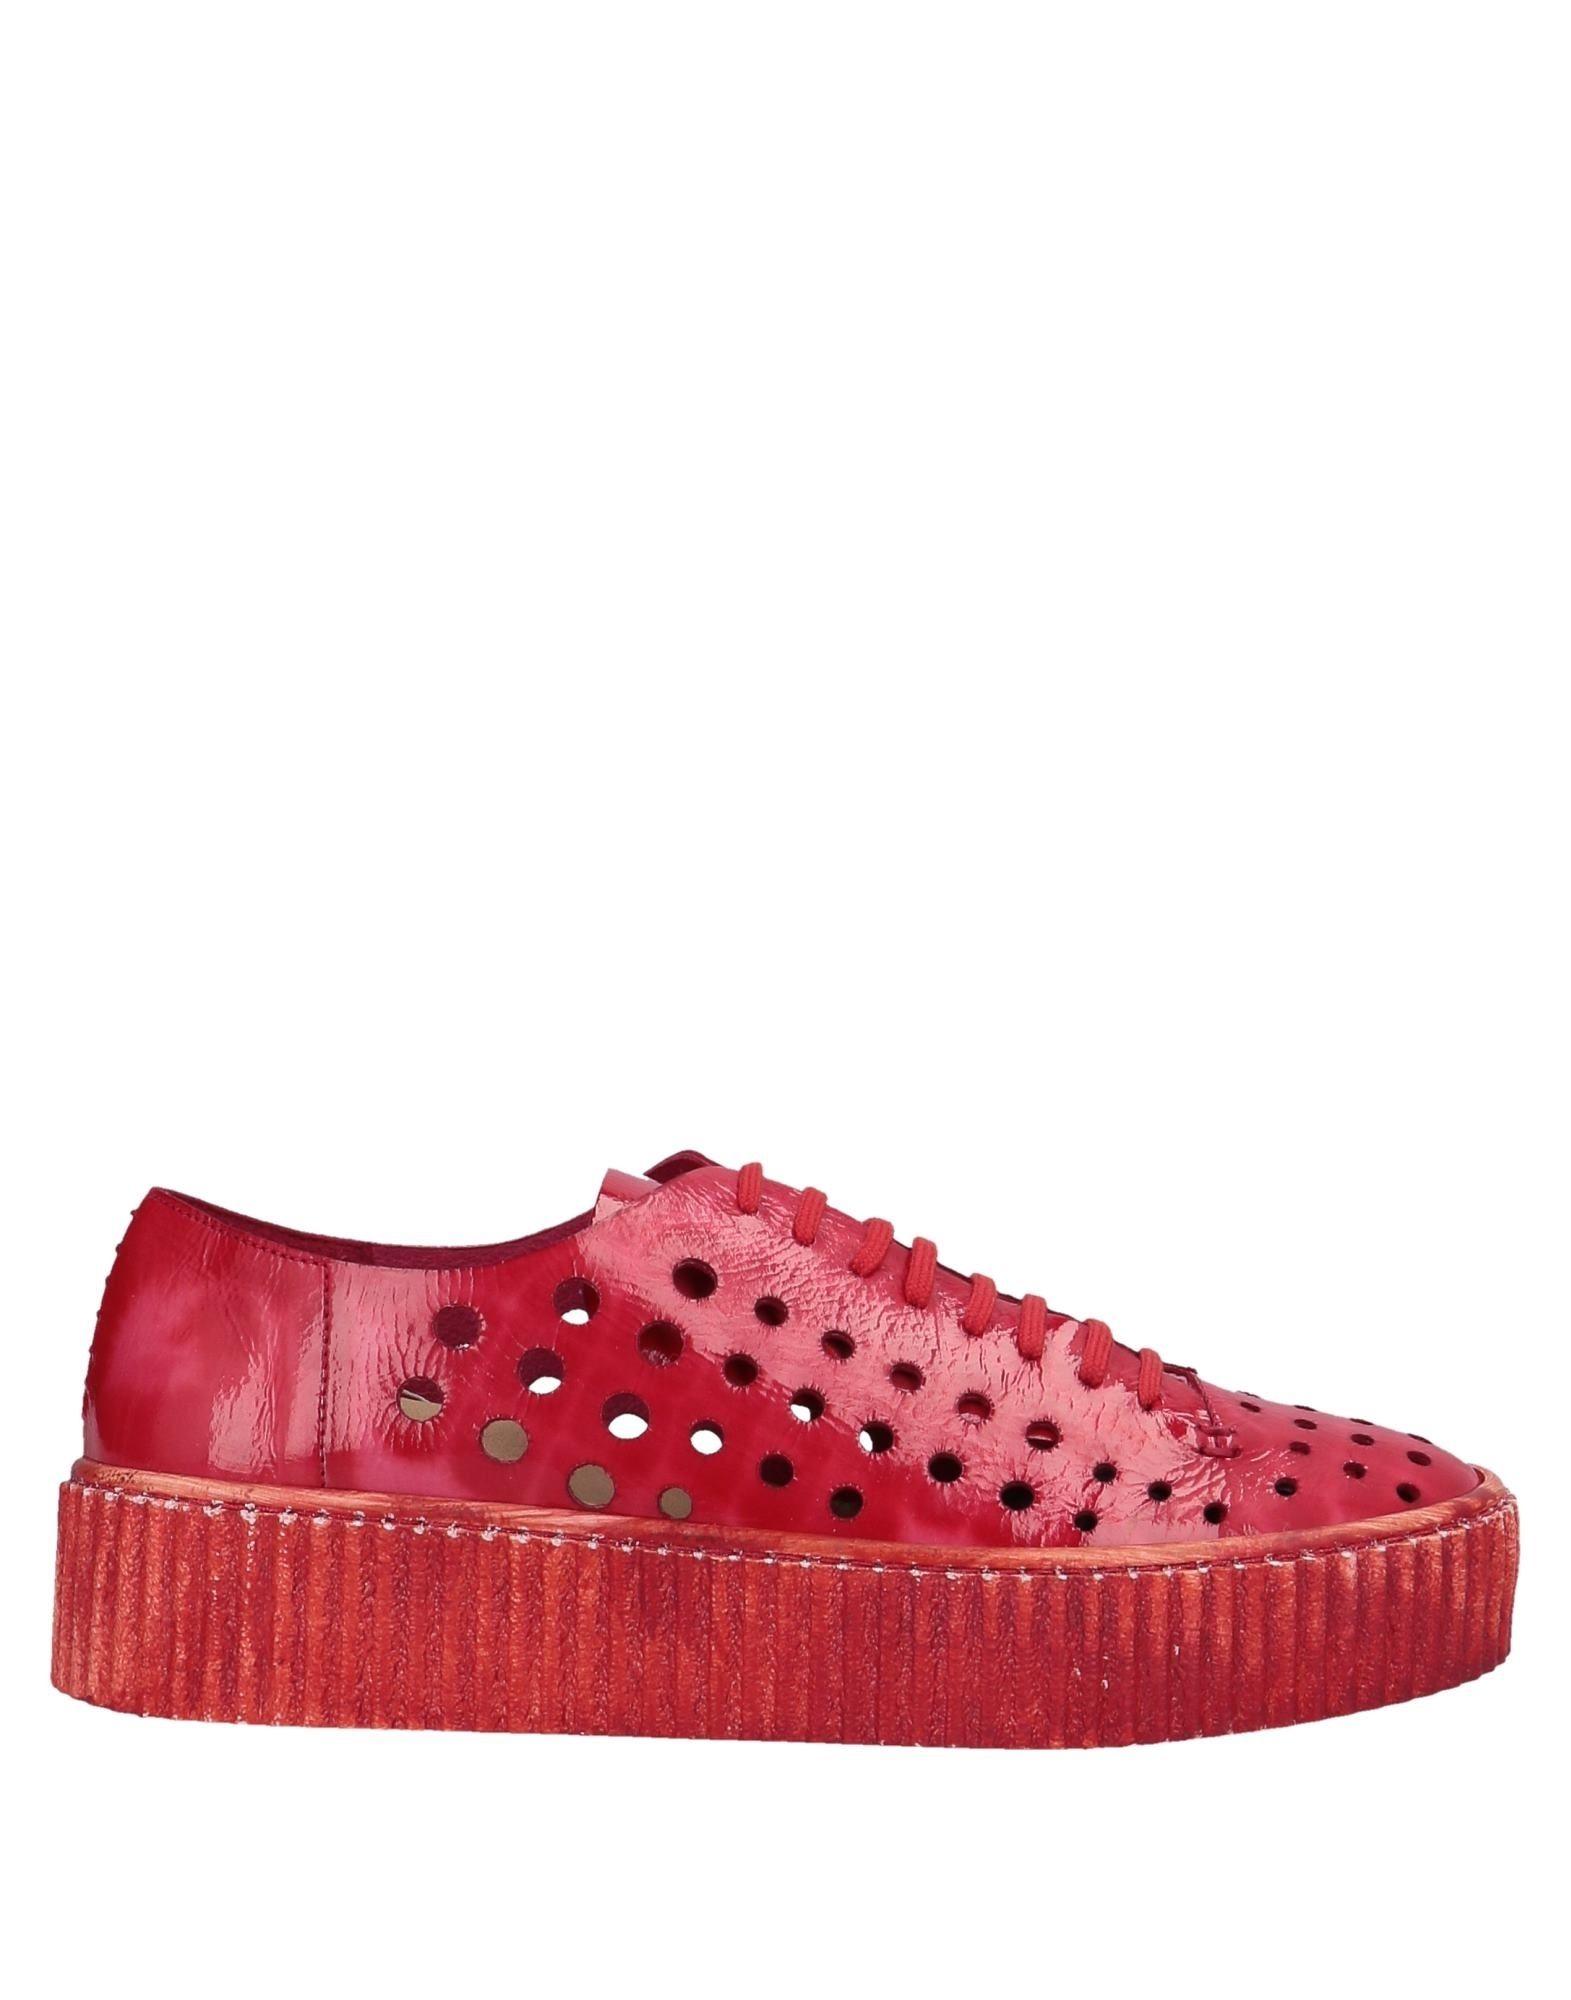 Pf16 Sneakers - Women Pf16 Sneakers online on 11560612HF  United Kingdom - 11560612HF on b4176d